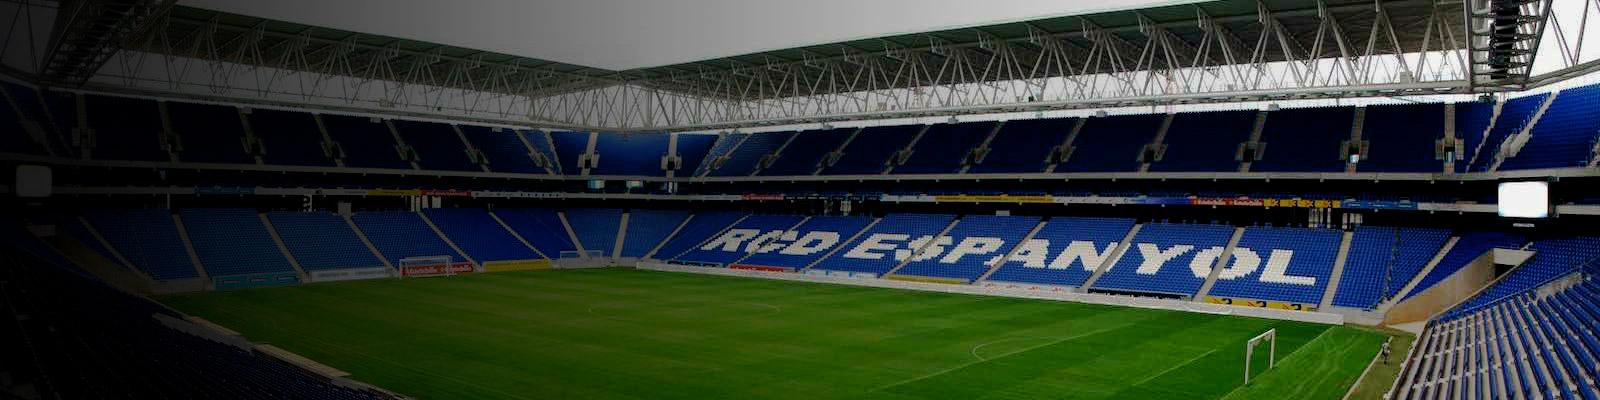 estadi-rcd-espanyol2